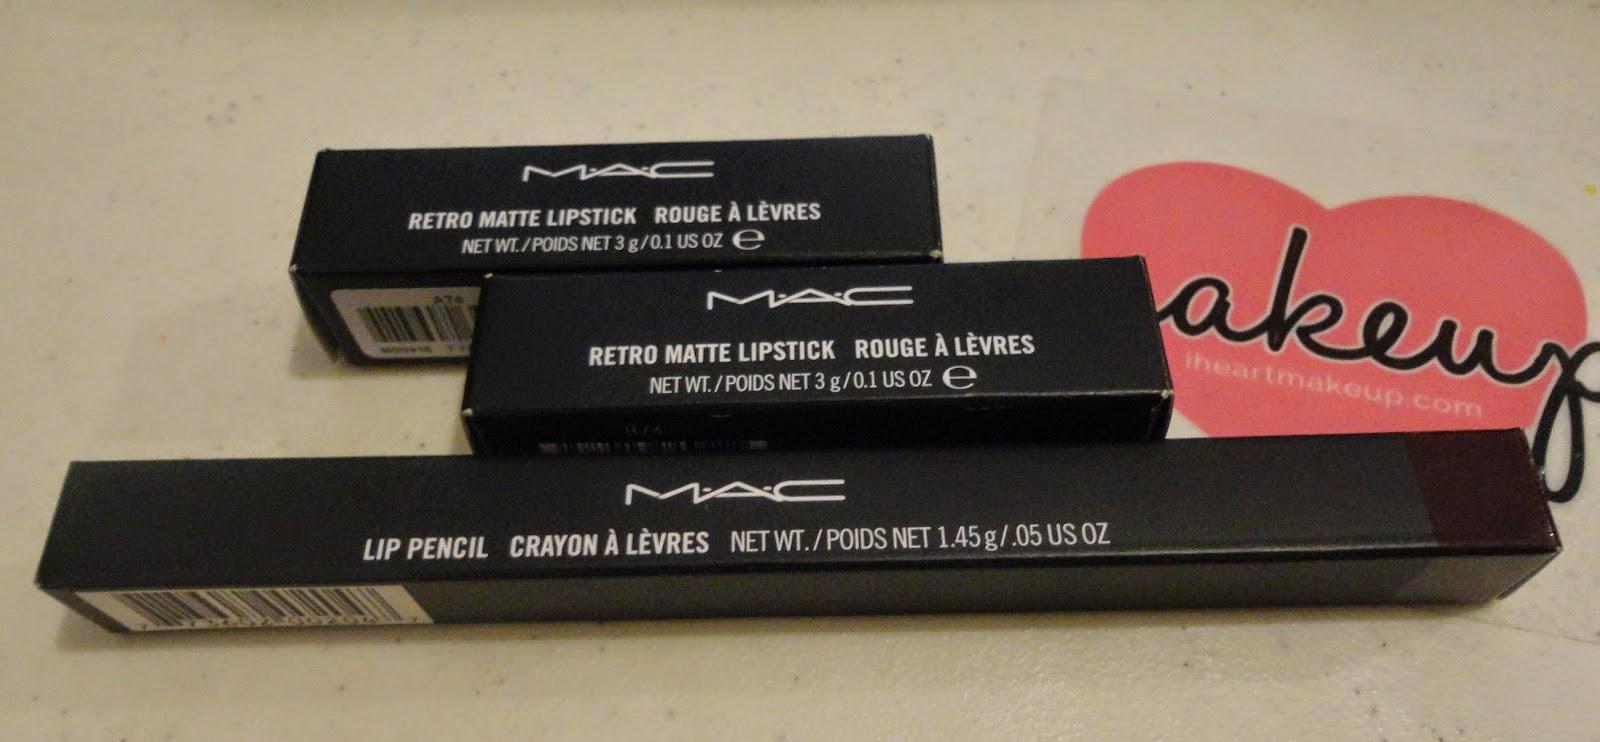 MAC Cosmetics Lipsticks & Lip Pencil